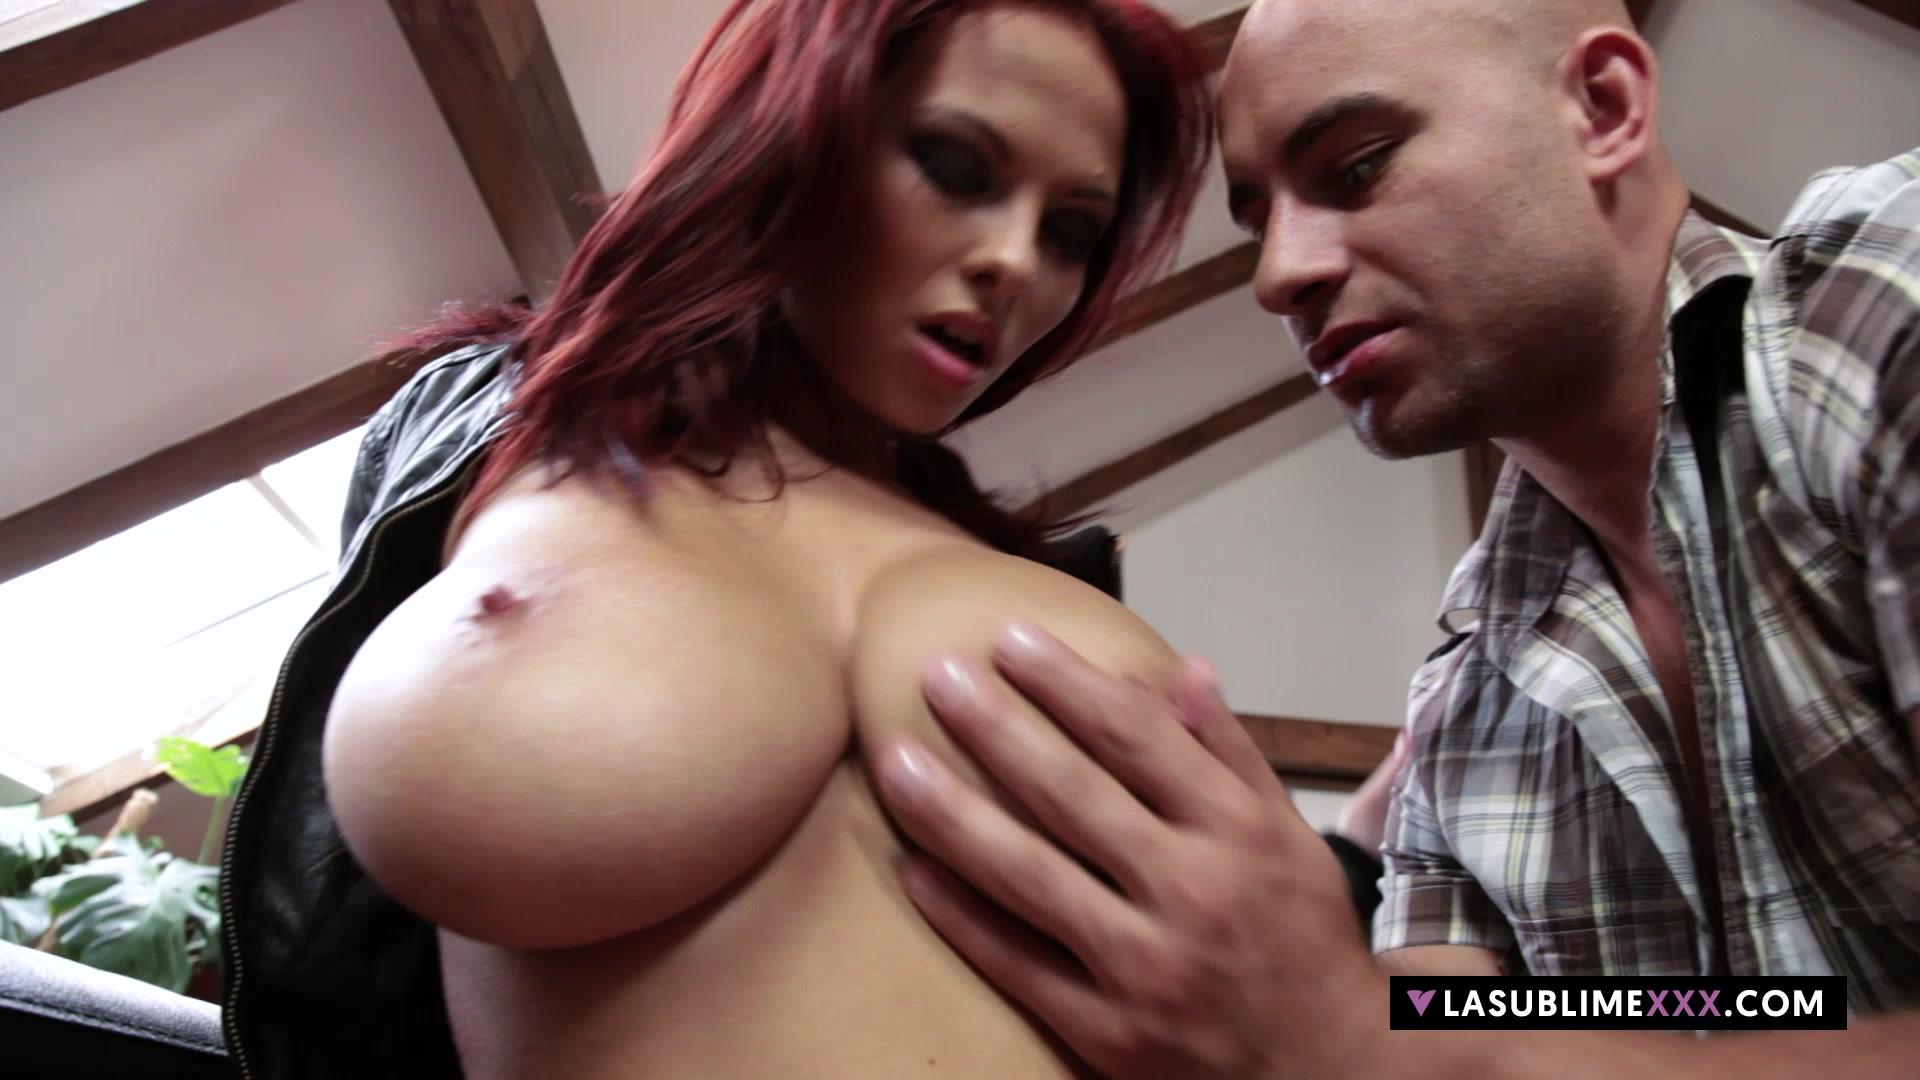 LaSublimeXXX Busty redhead Domino gets her pussy drill Big light skin ebony boobs